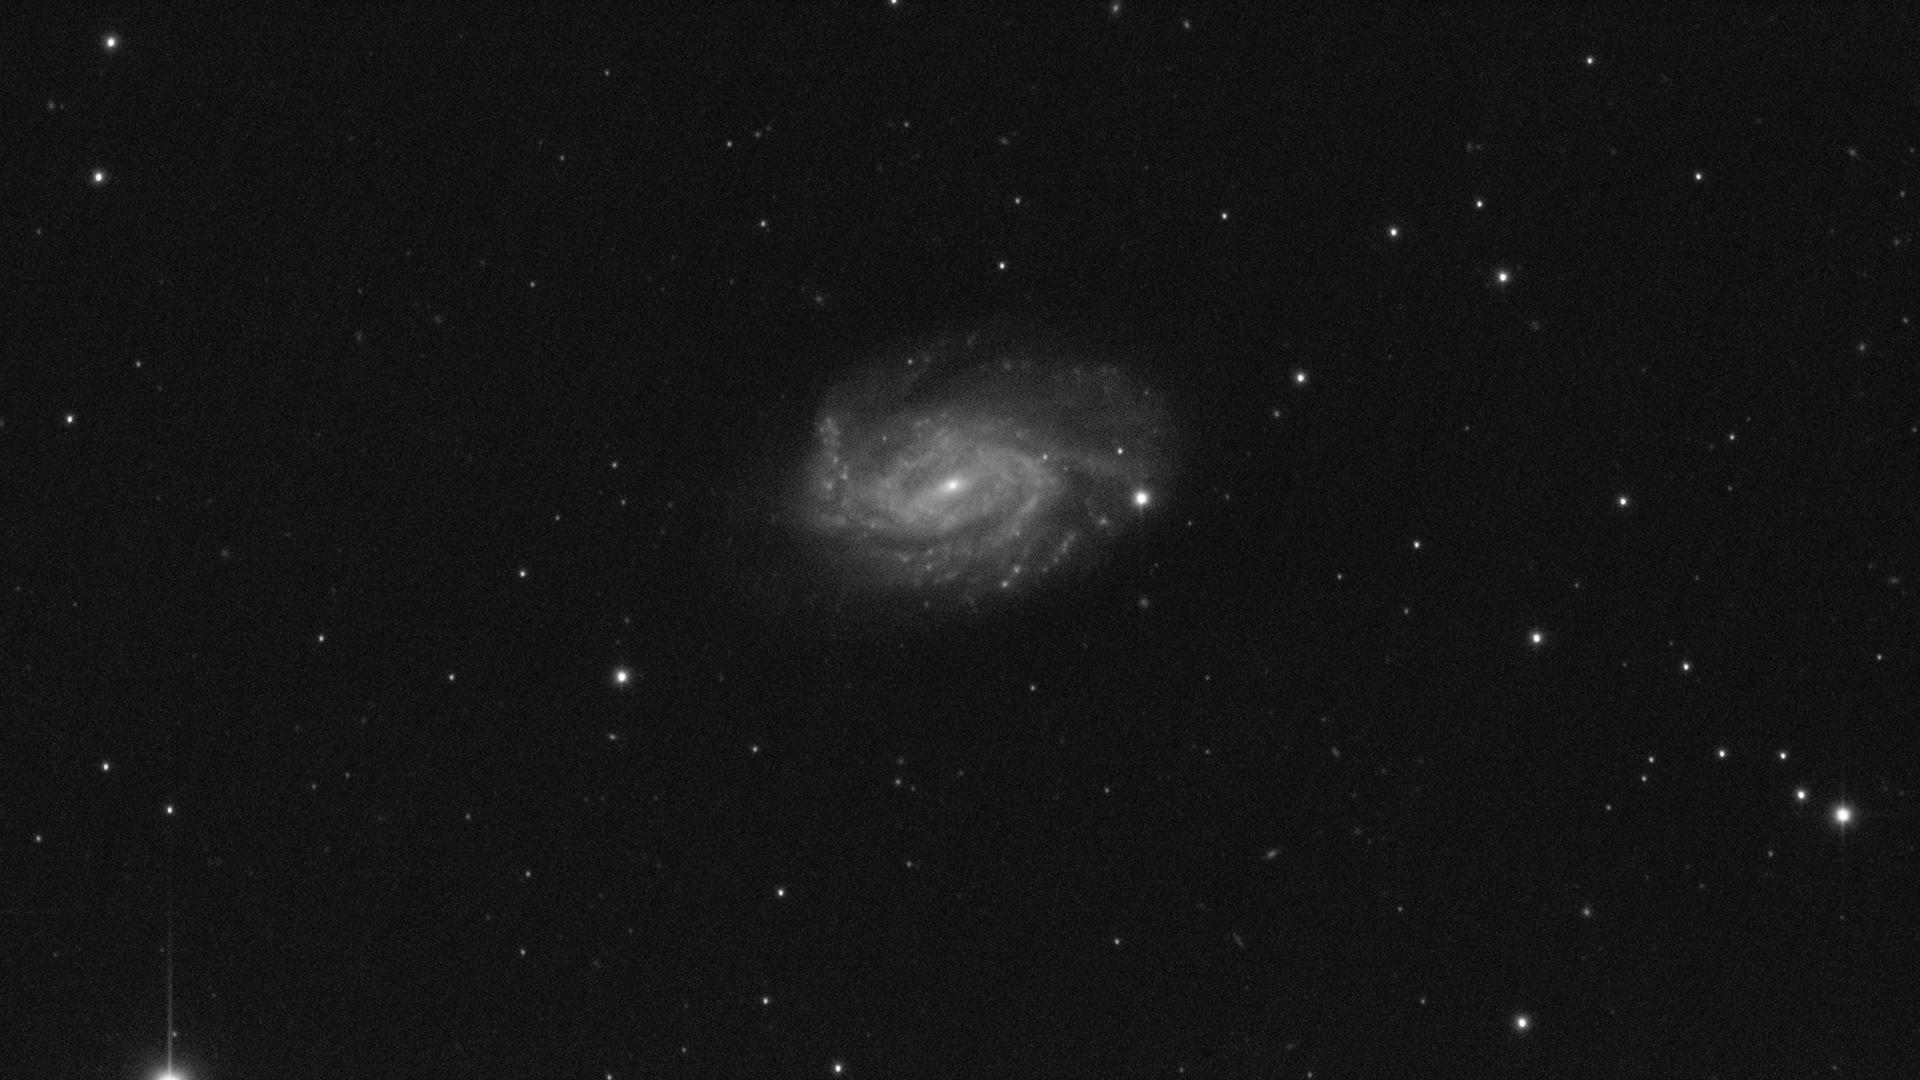 r_pp_NGC3726_stackeda.png.aab26a98286309c6e3478b6c66c319ad.png